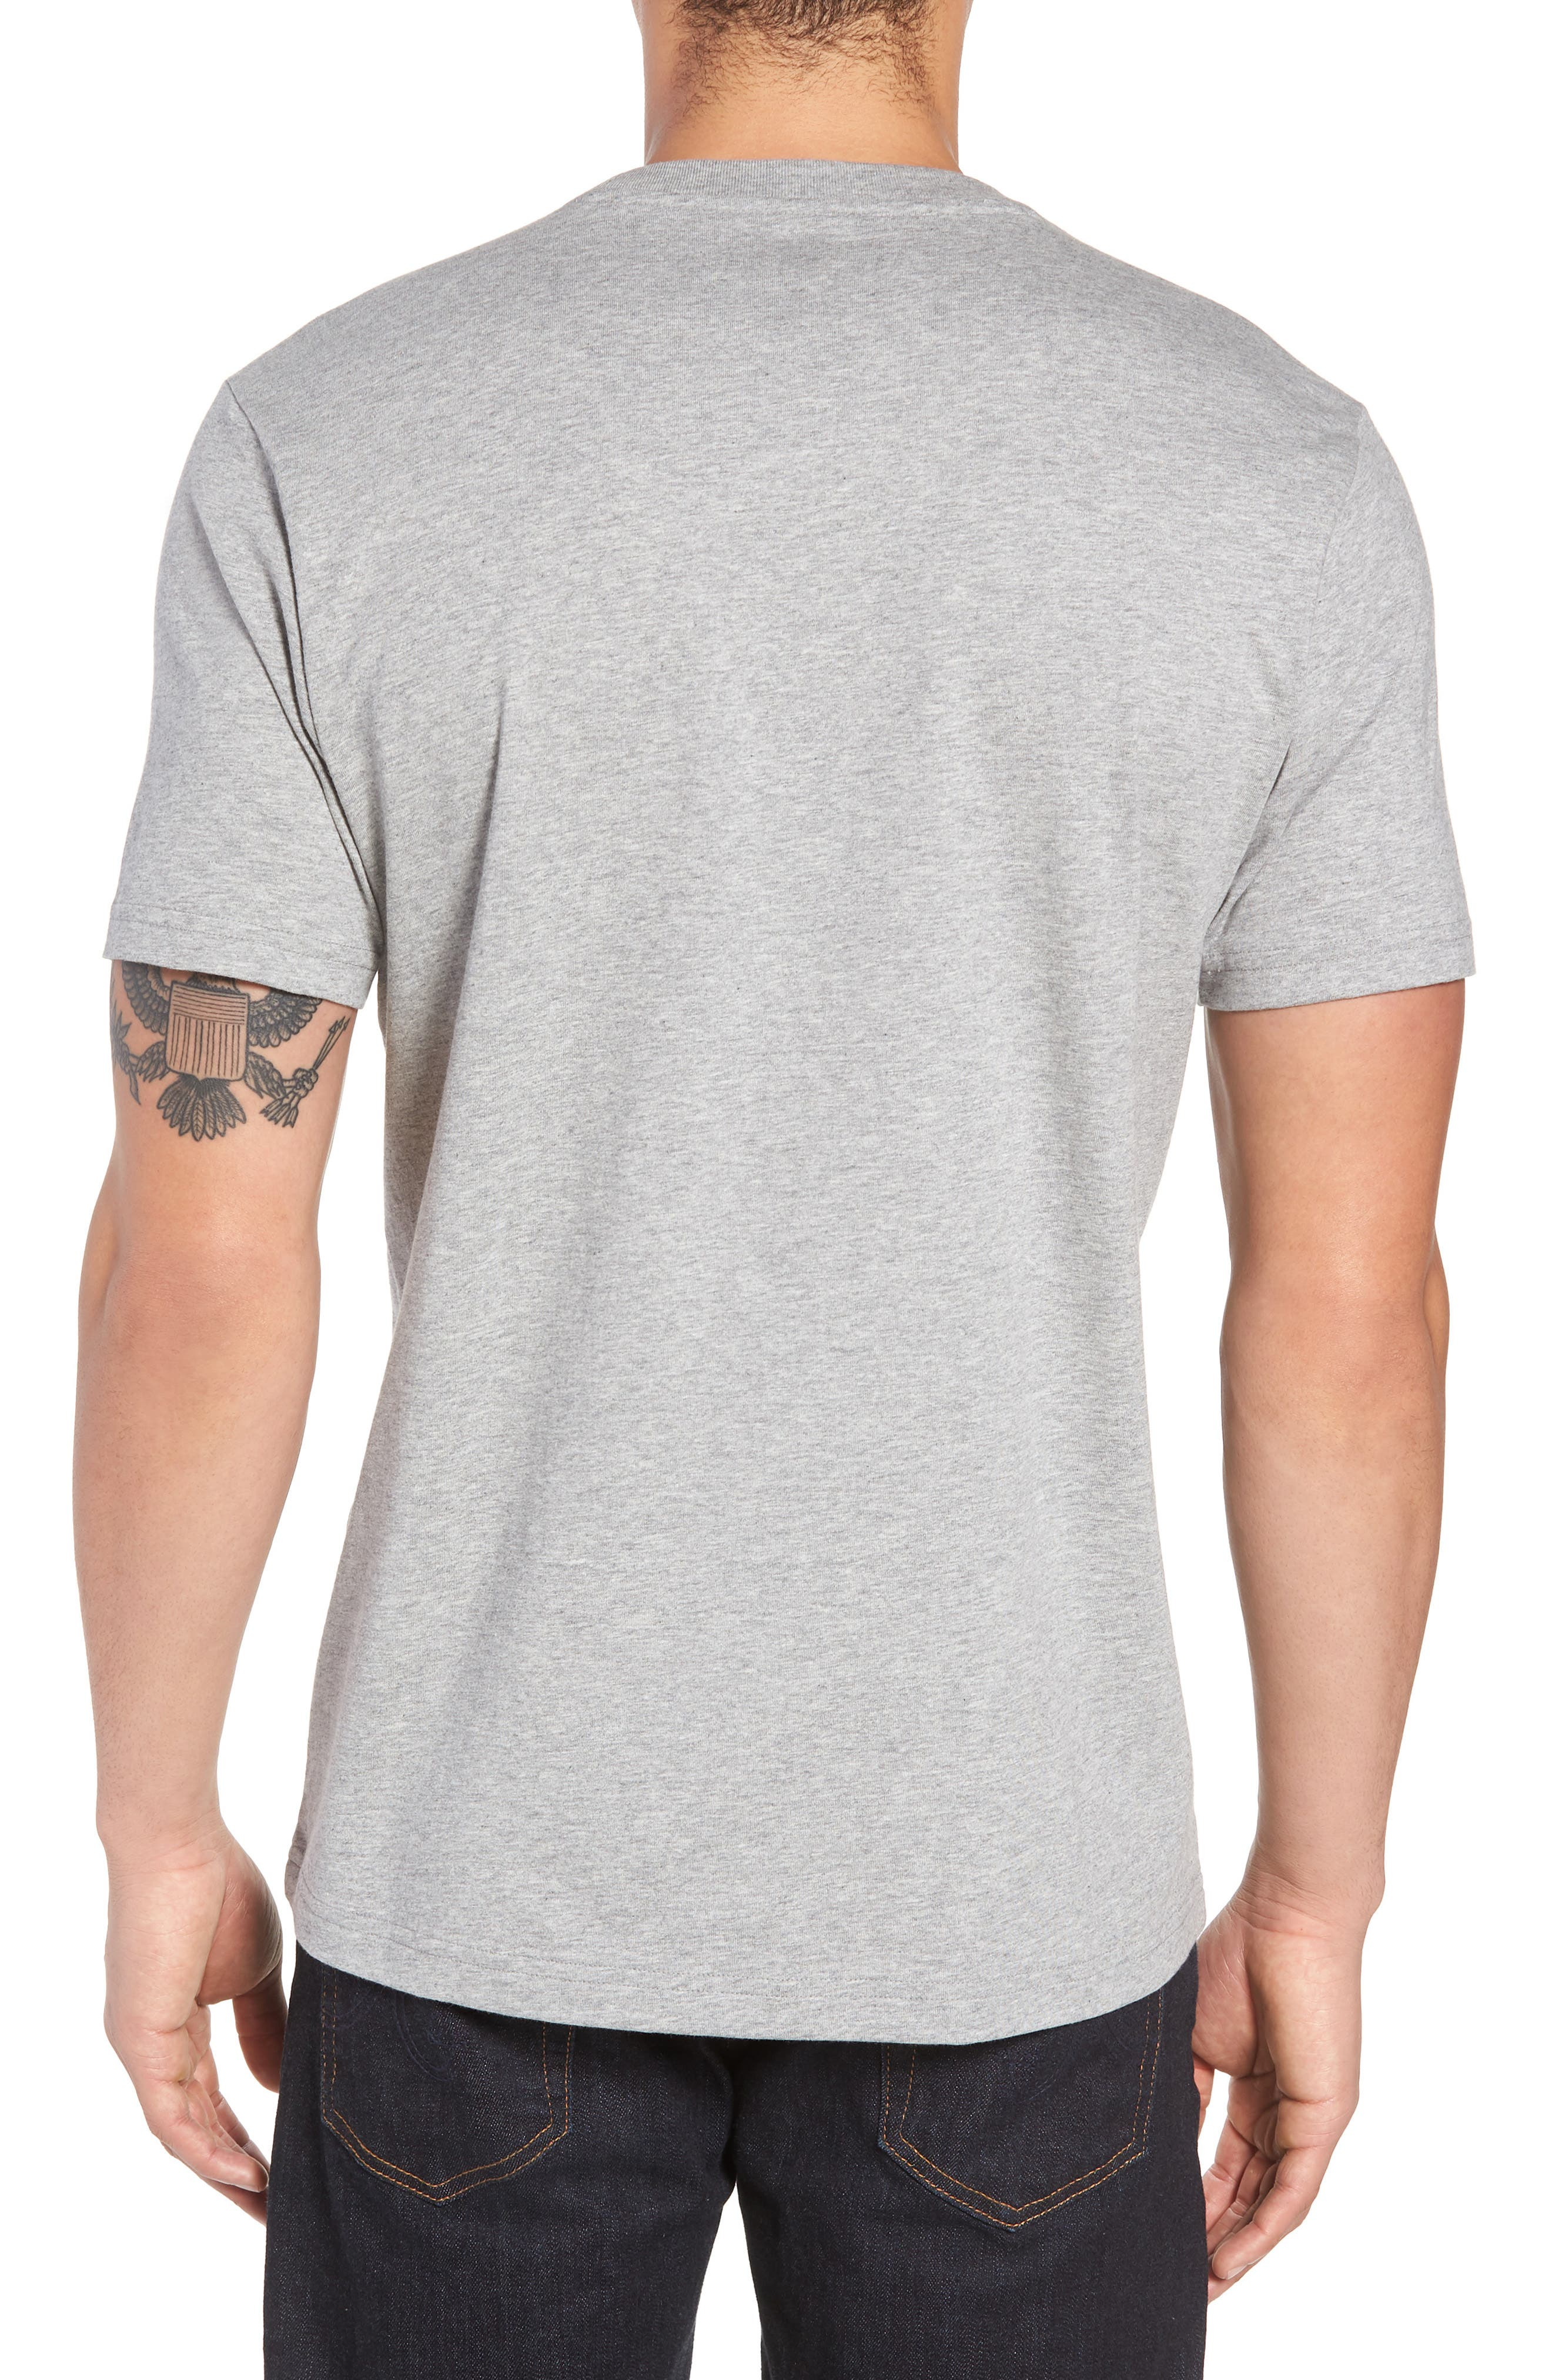 PSYCHO BUNNY,                             Print T-Shirt,                             Alternate thumbnail 2, color,                             063